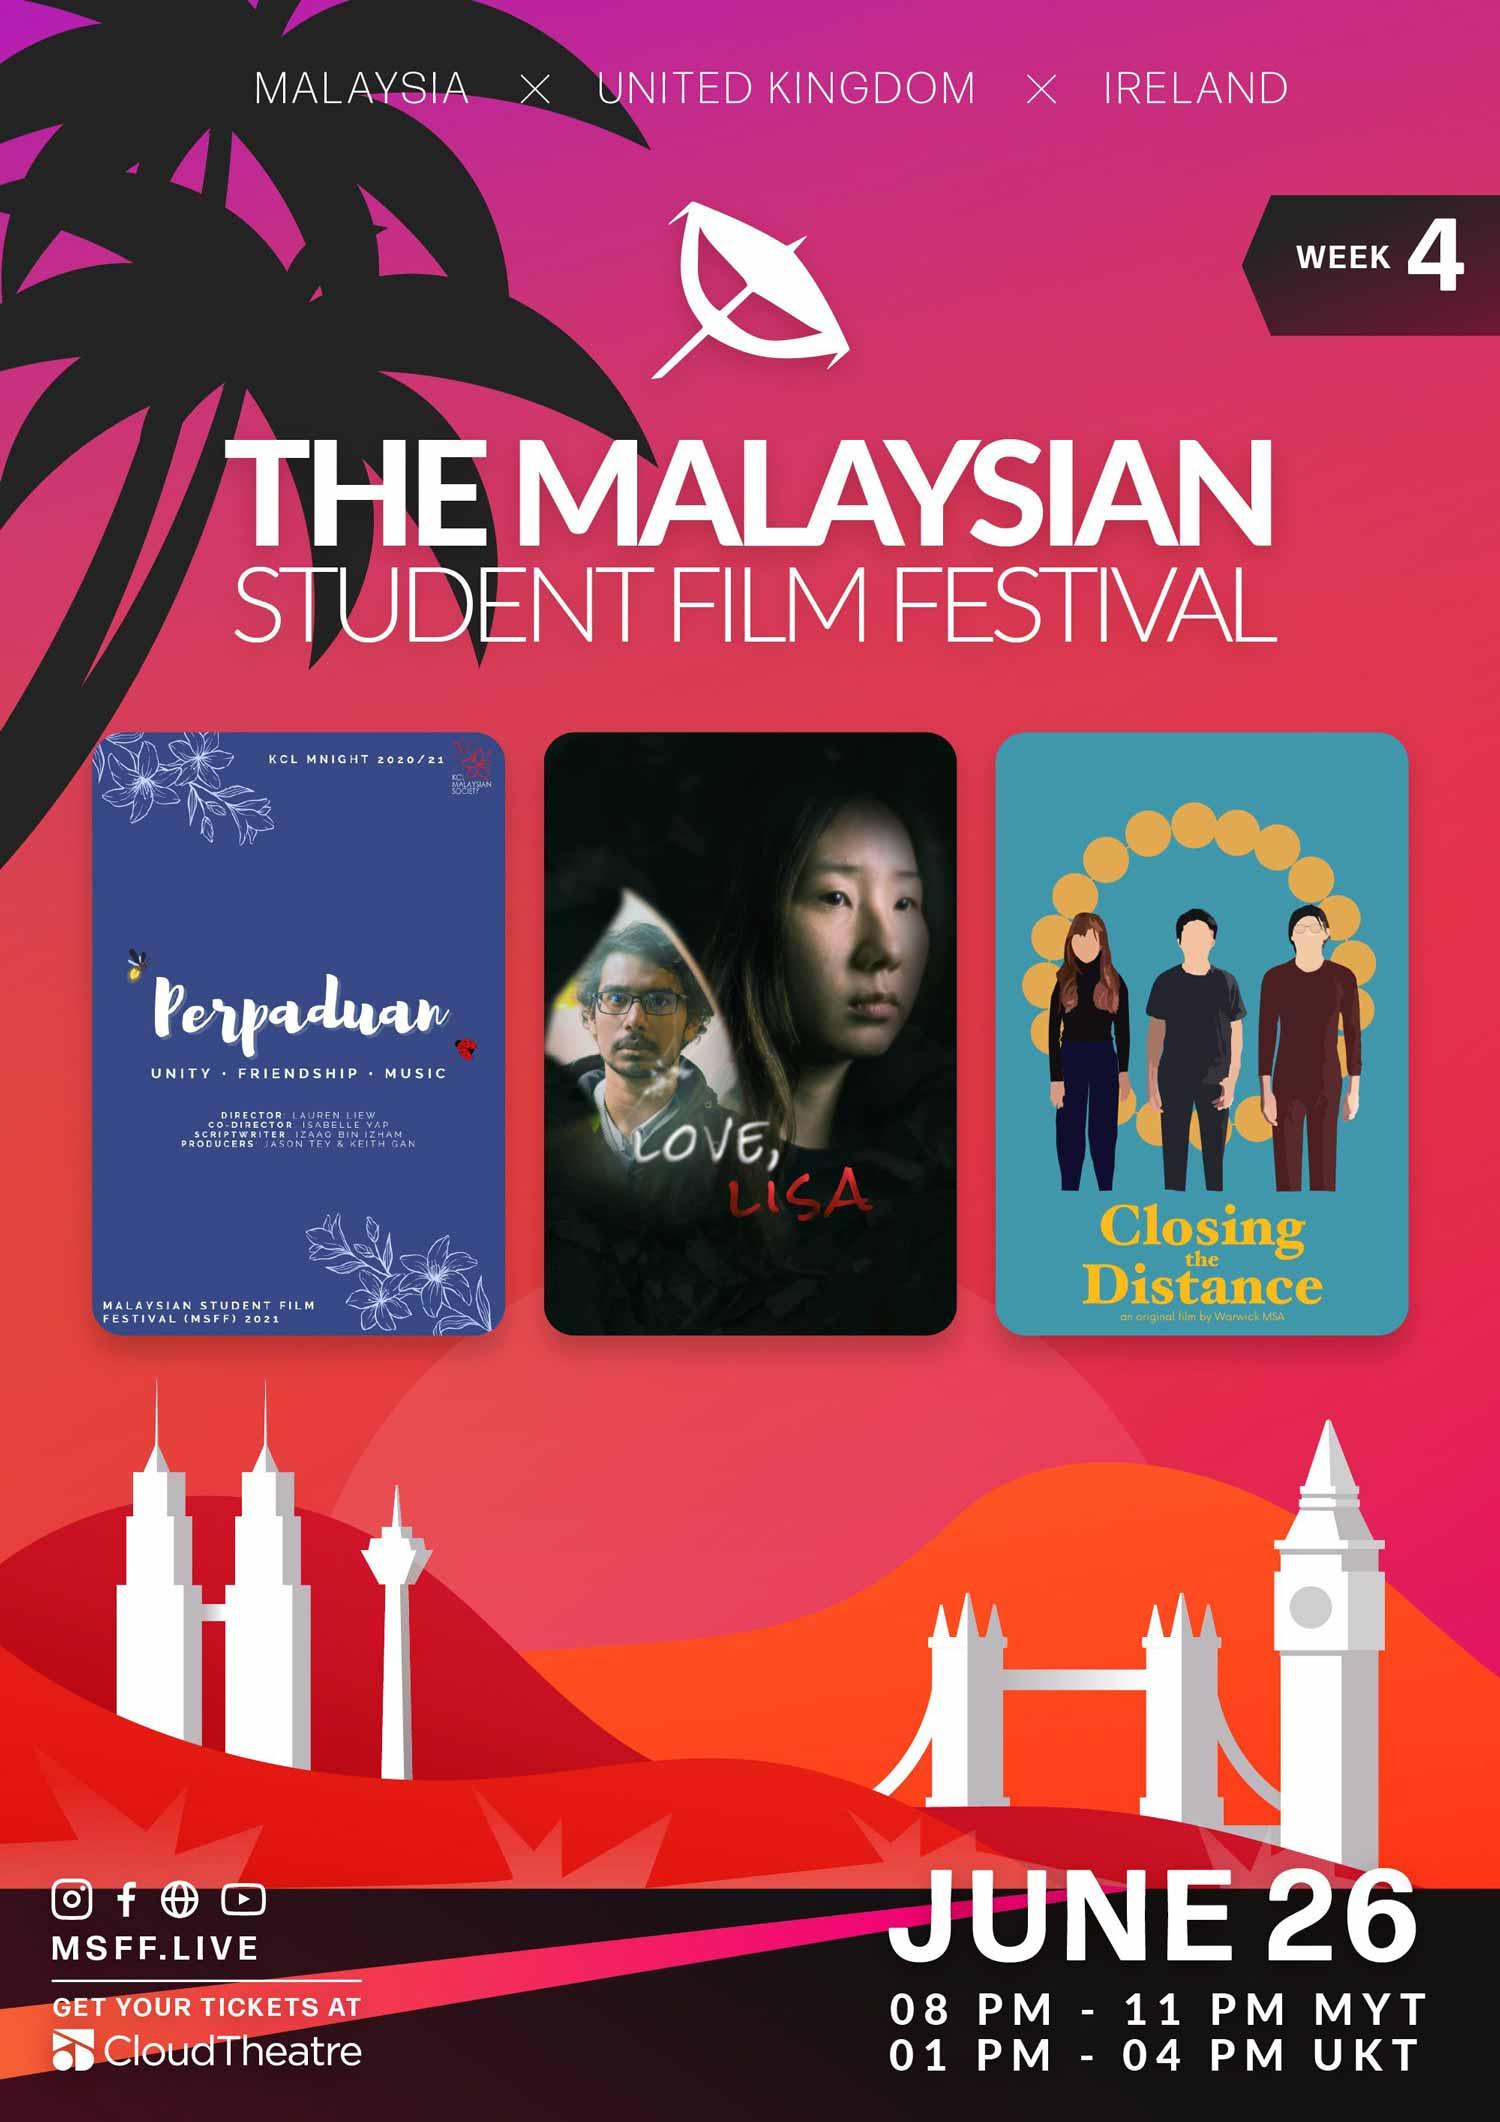 Week 4: Malaysian Student Film Festival